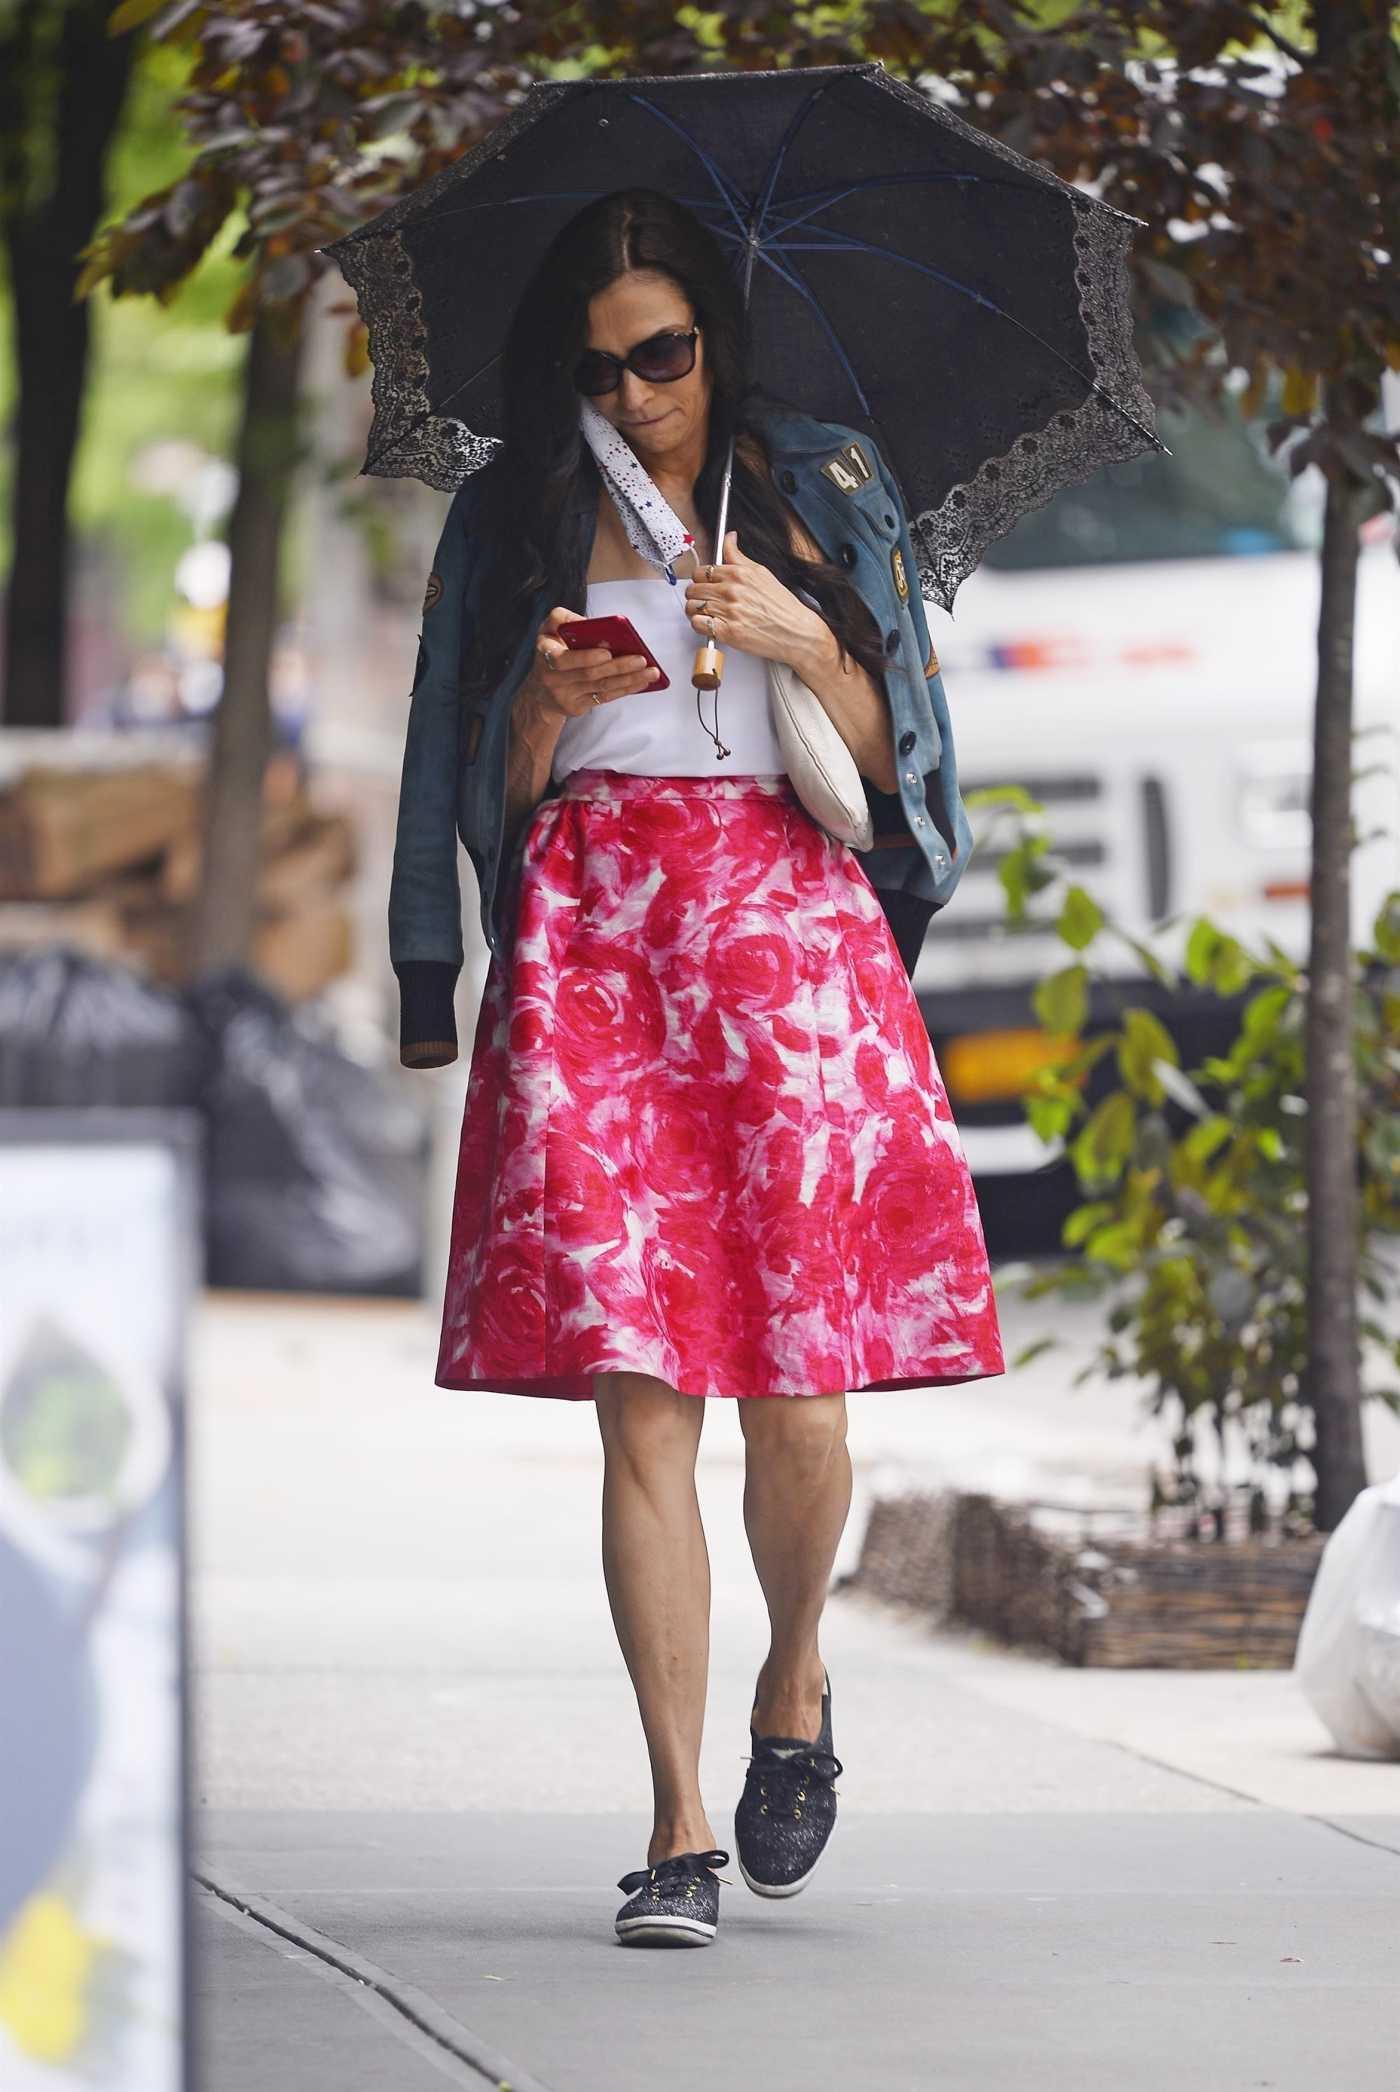 Famke Janssen in a Bright Summer Skirt Was Seen Out in New York 06/02/2020